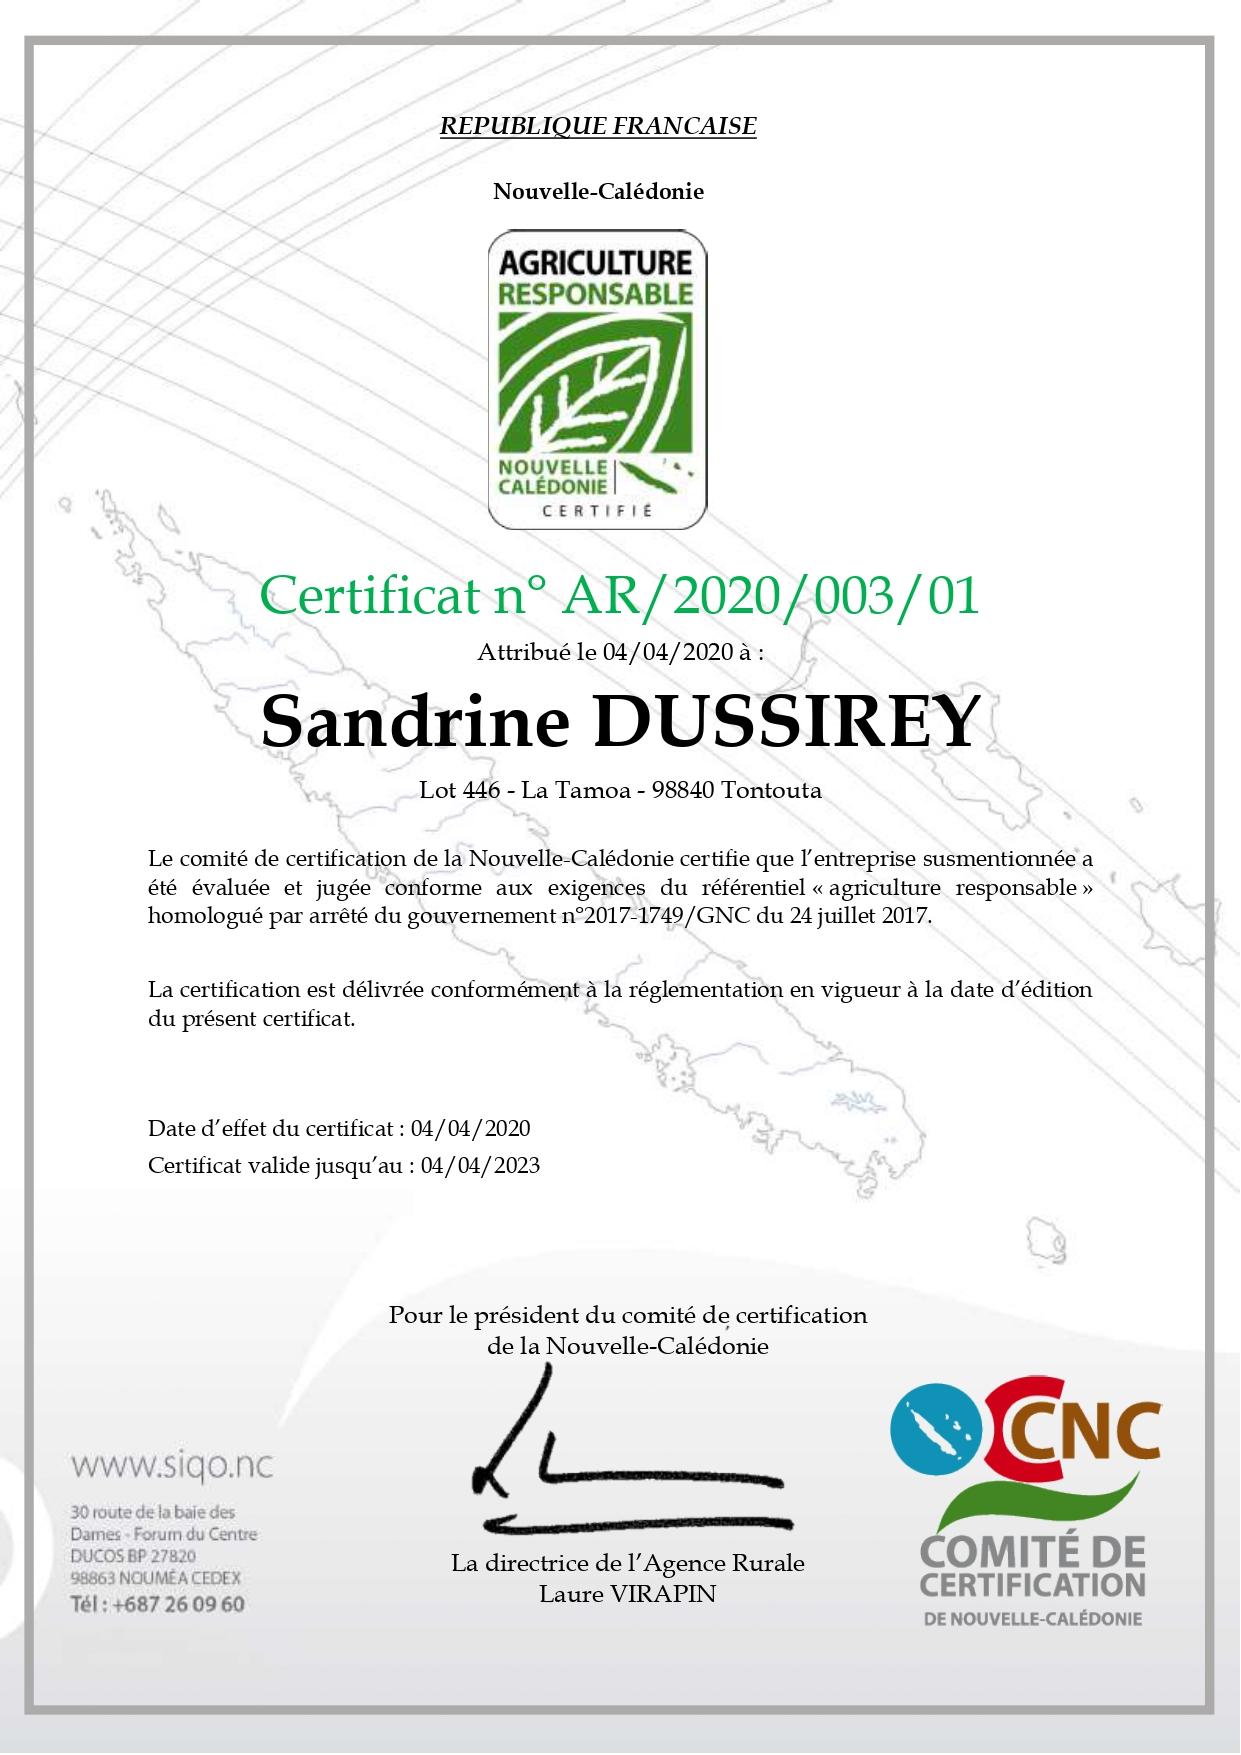 Agriculture+Responsable+AR+association+certification+nouvelle caledonie+innovante+sandrine+dussirey